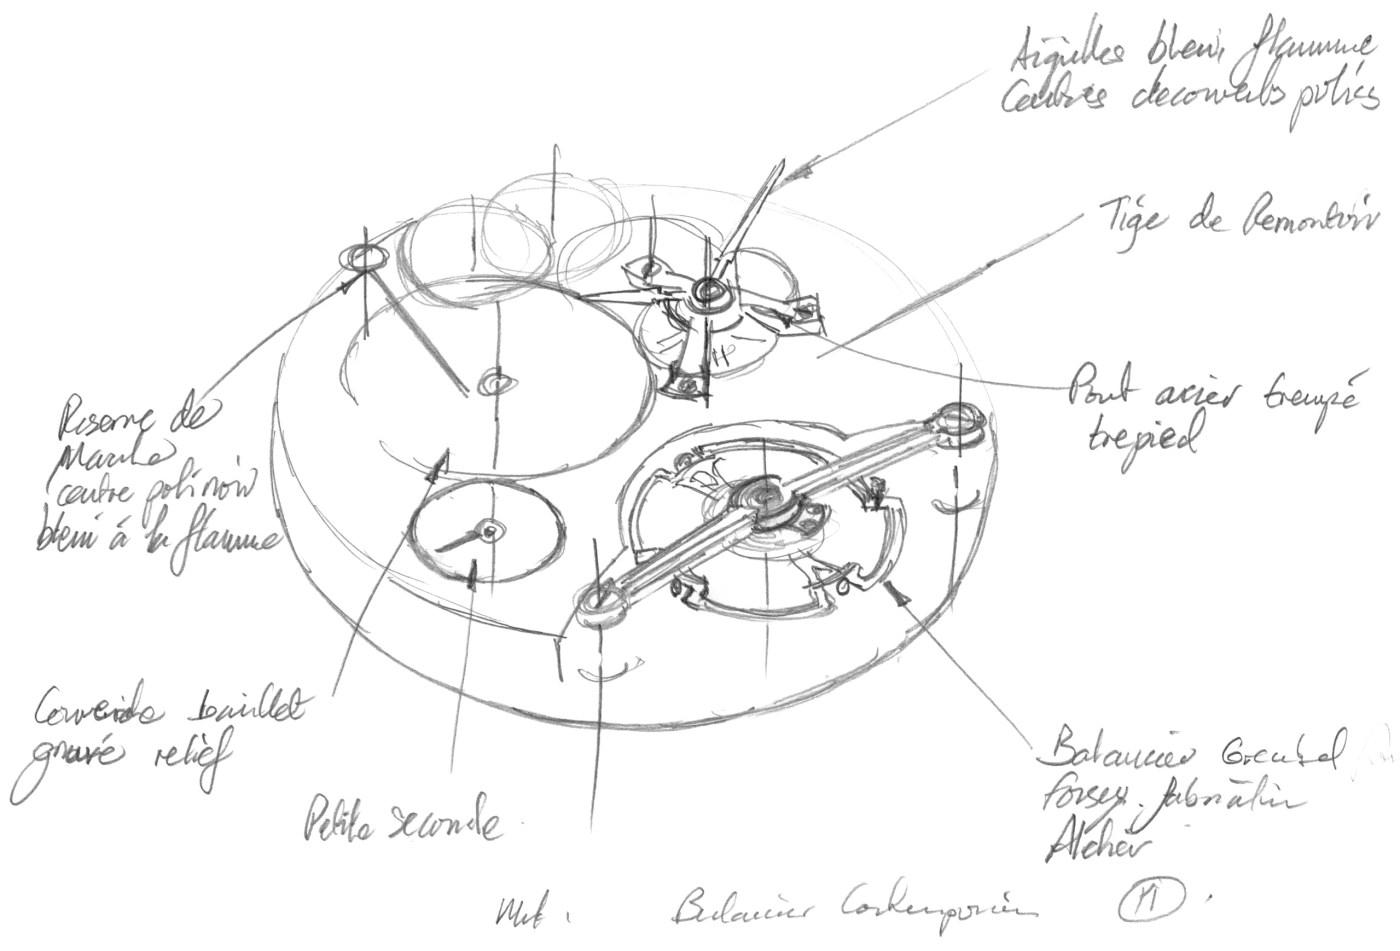 Sketch by Stephen Forsey